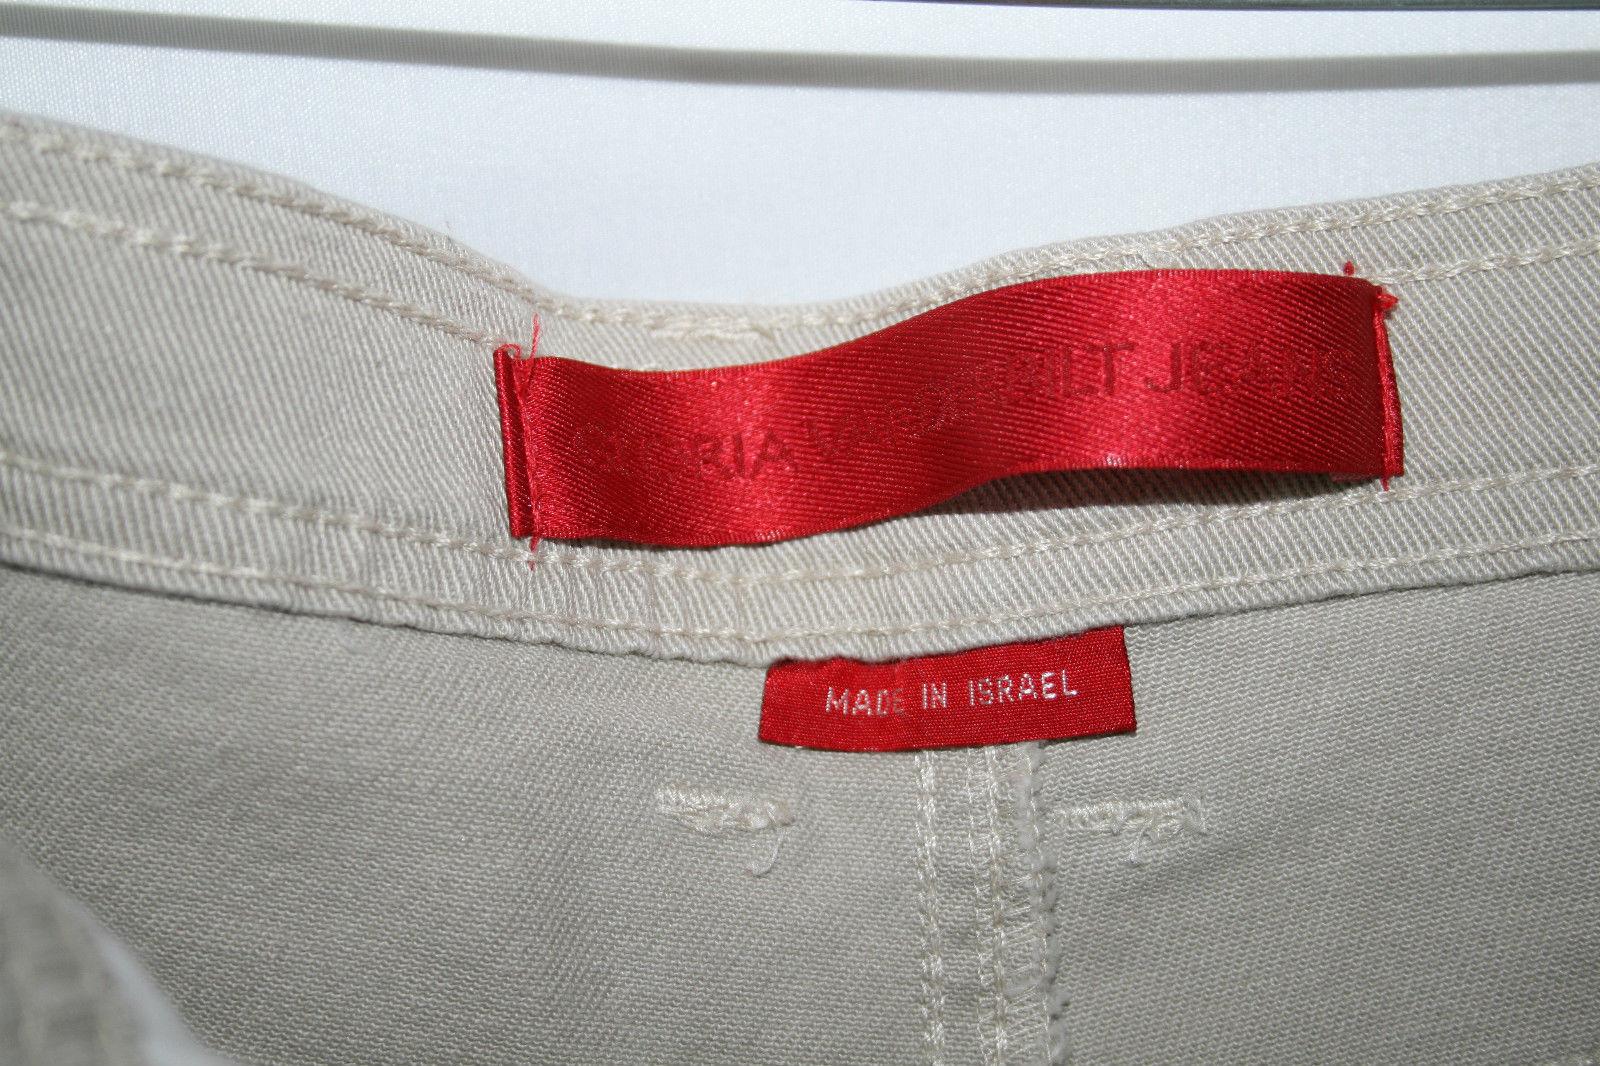 GLORIA VANDERBILT Beige  5 Pkt Stretch Jeans  Size 10 Petite    D281